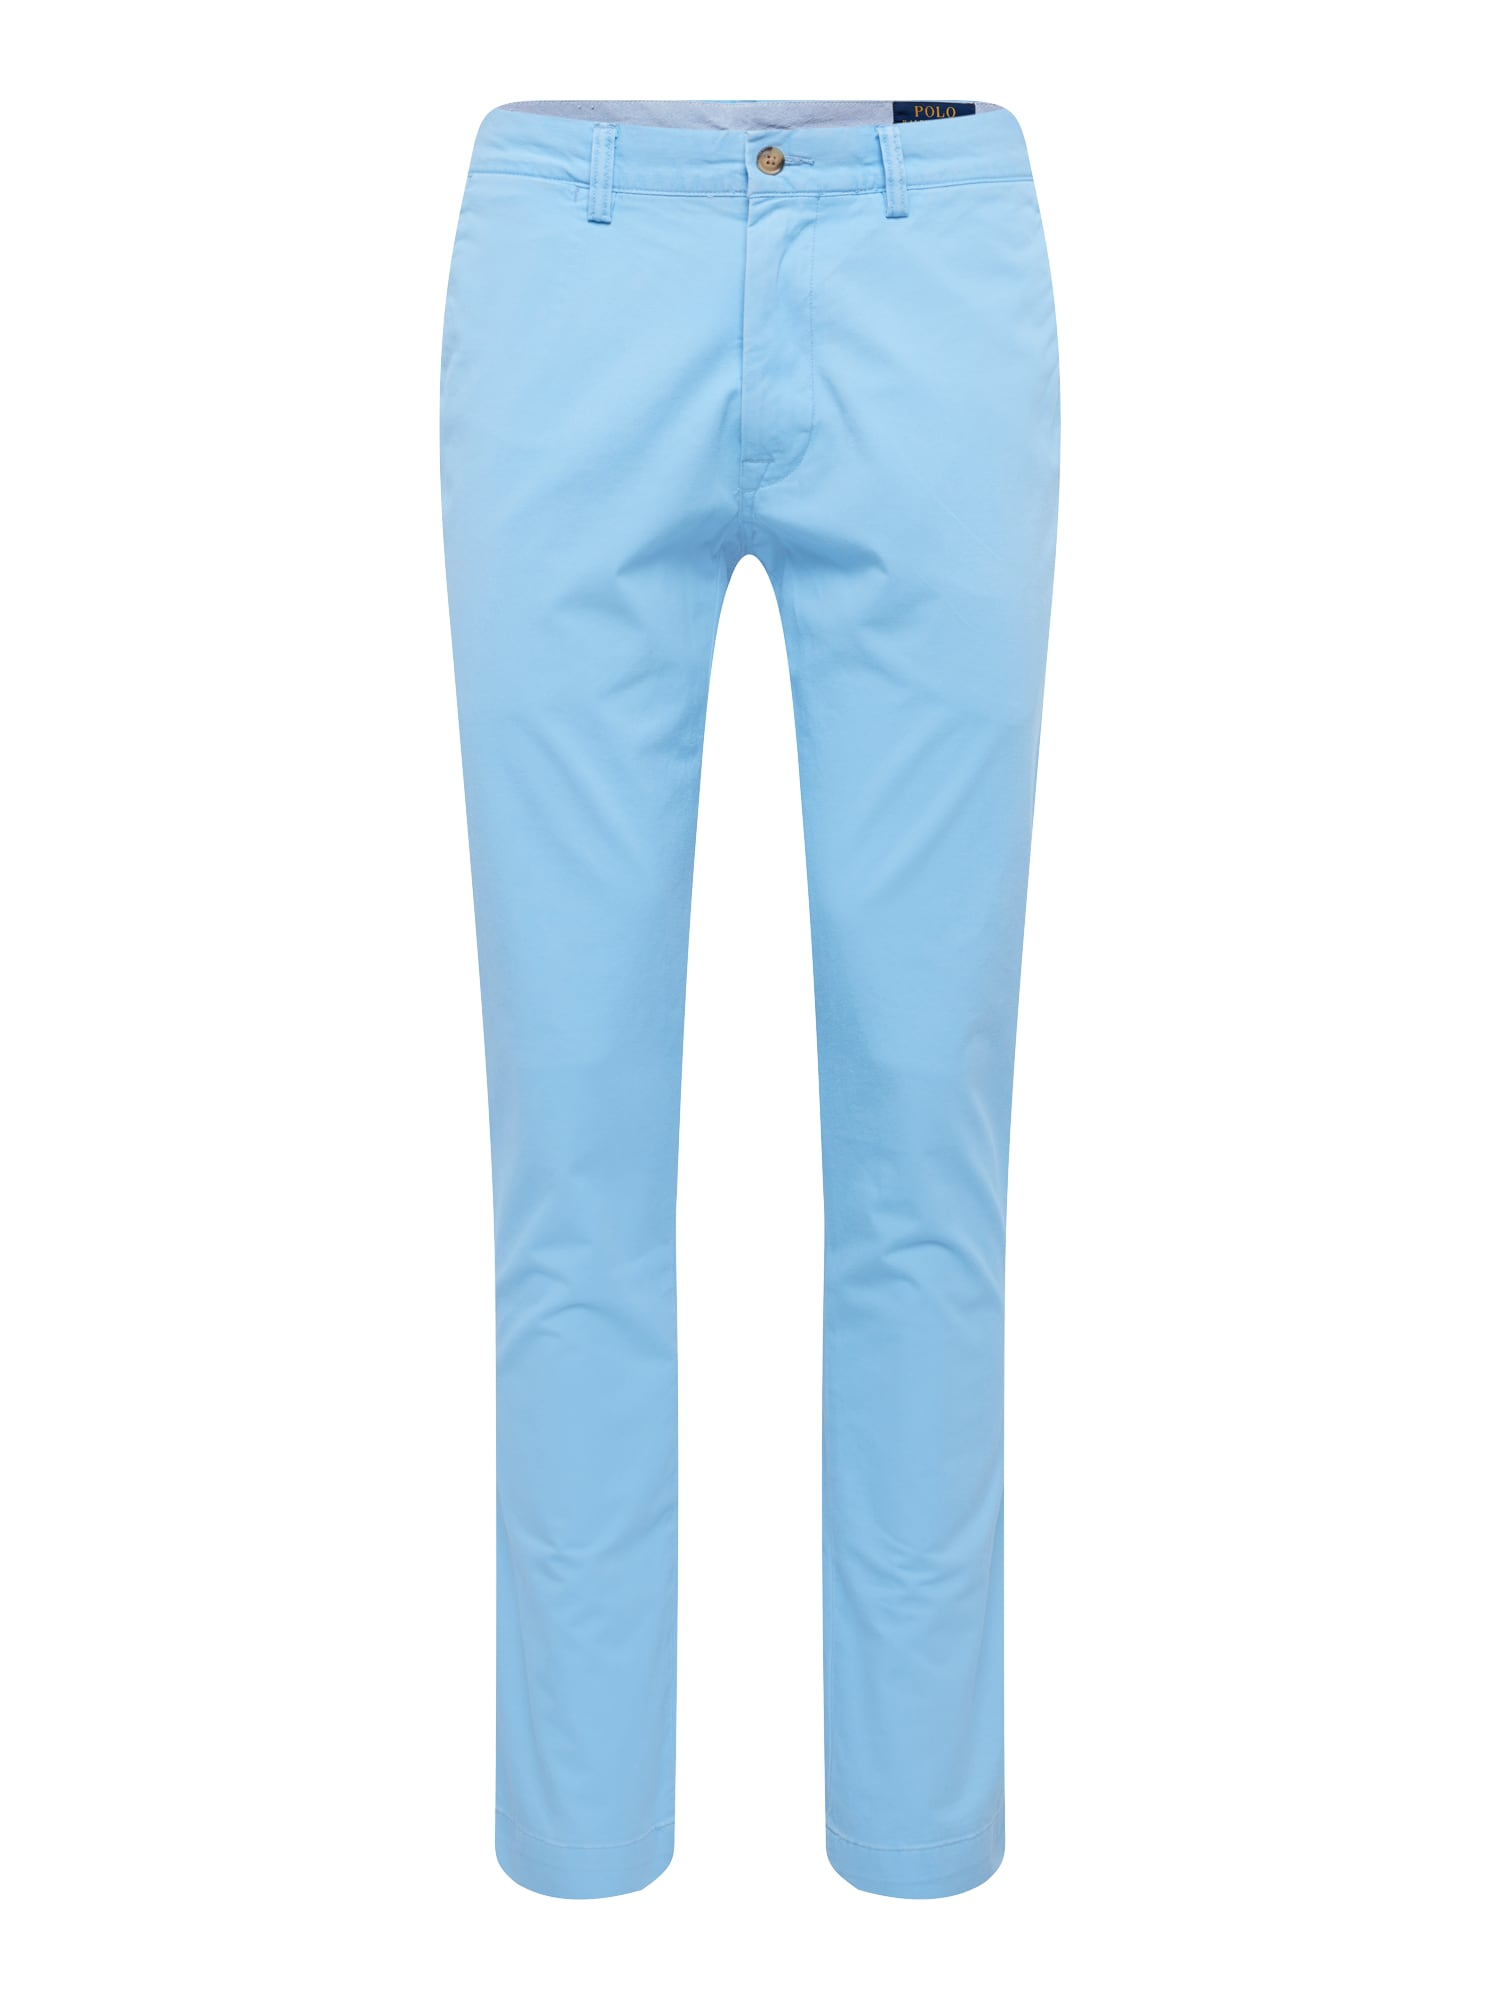 Chino kalhoty BEDFORD světlemodrá POLO RALPH LAUREN